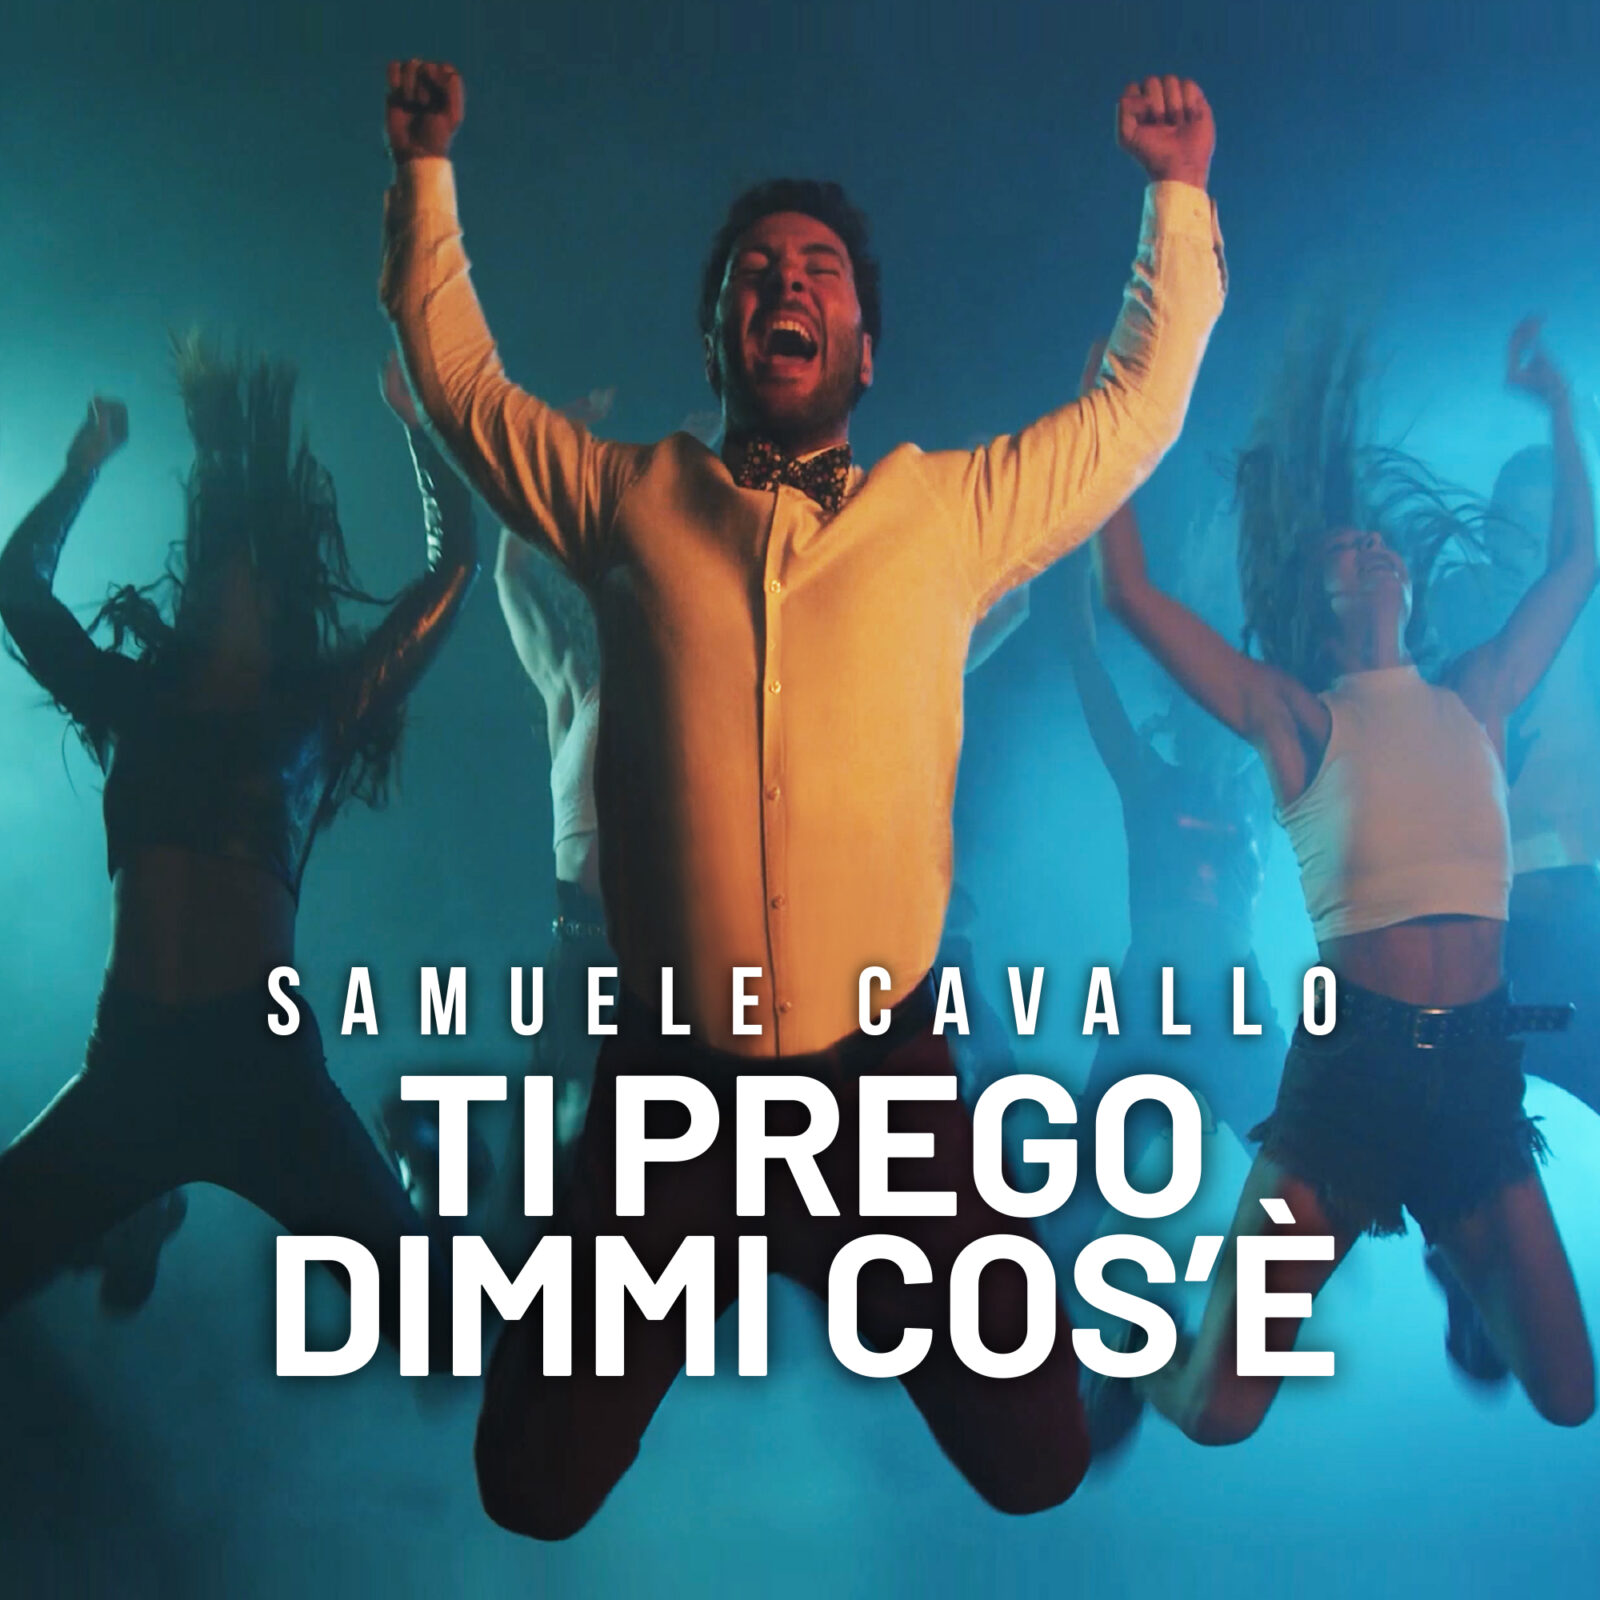 Samuele Cavallo cover ok